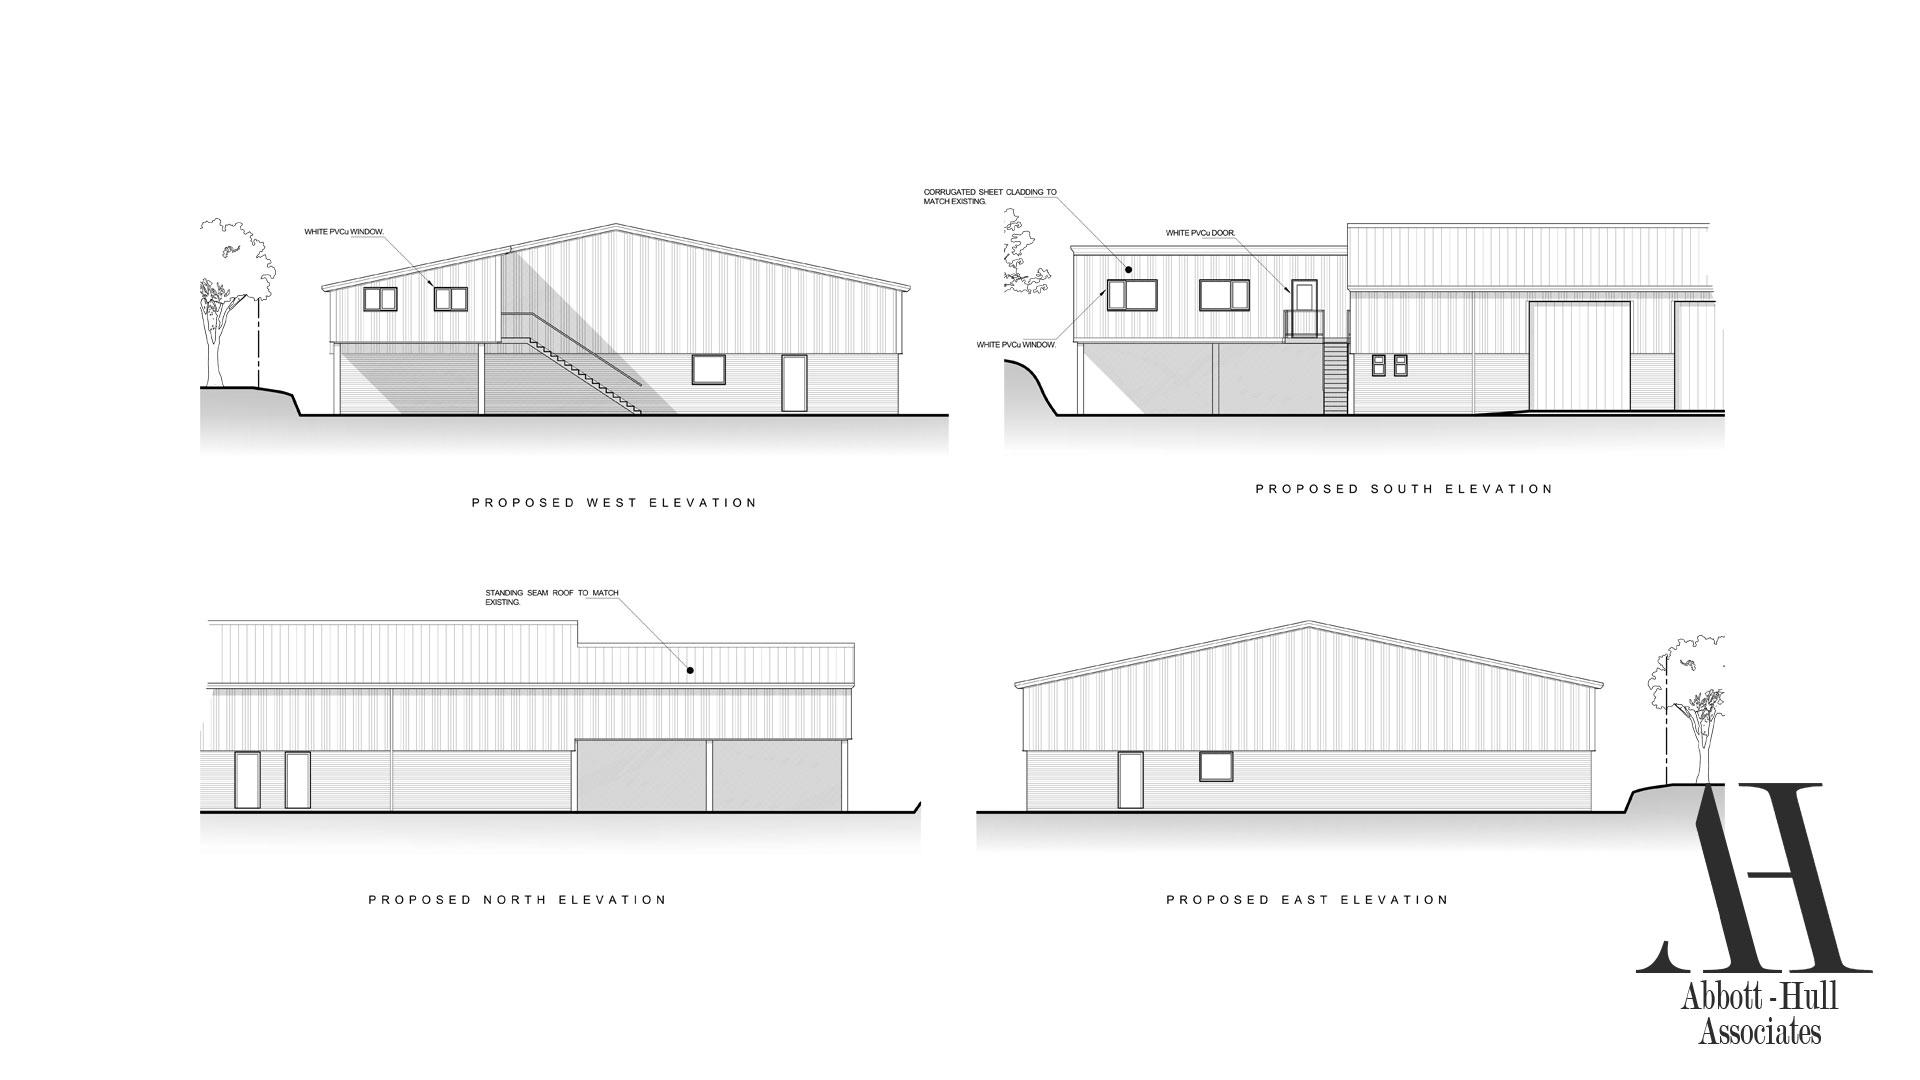 Unit 9 Wyrefields, Poulton Industrial Estate - Proposed Elevations